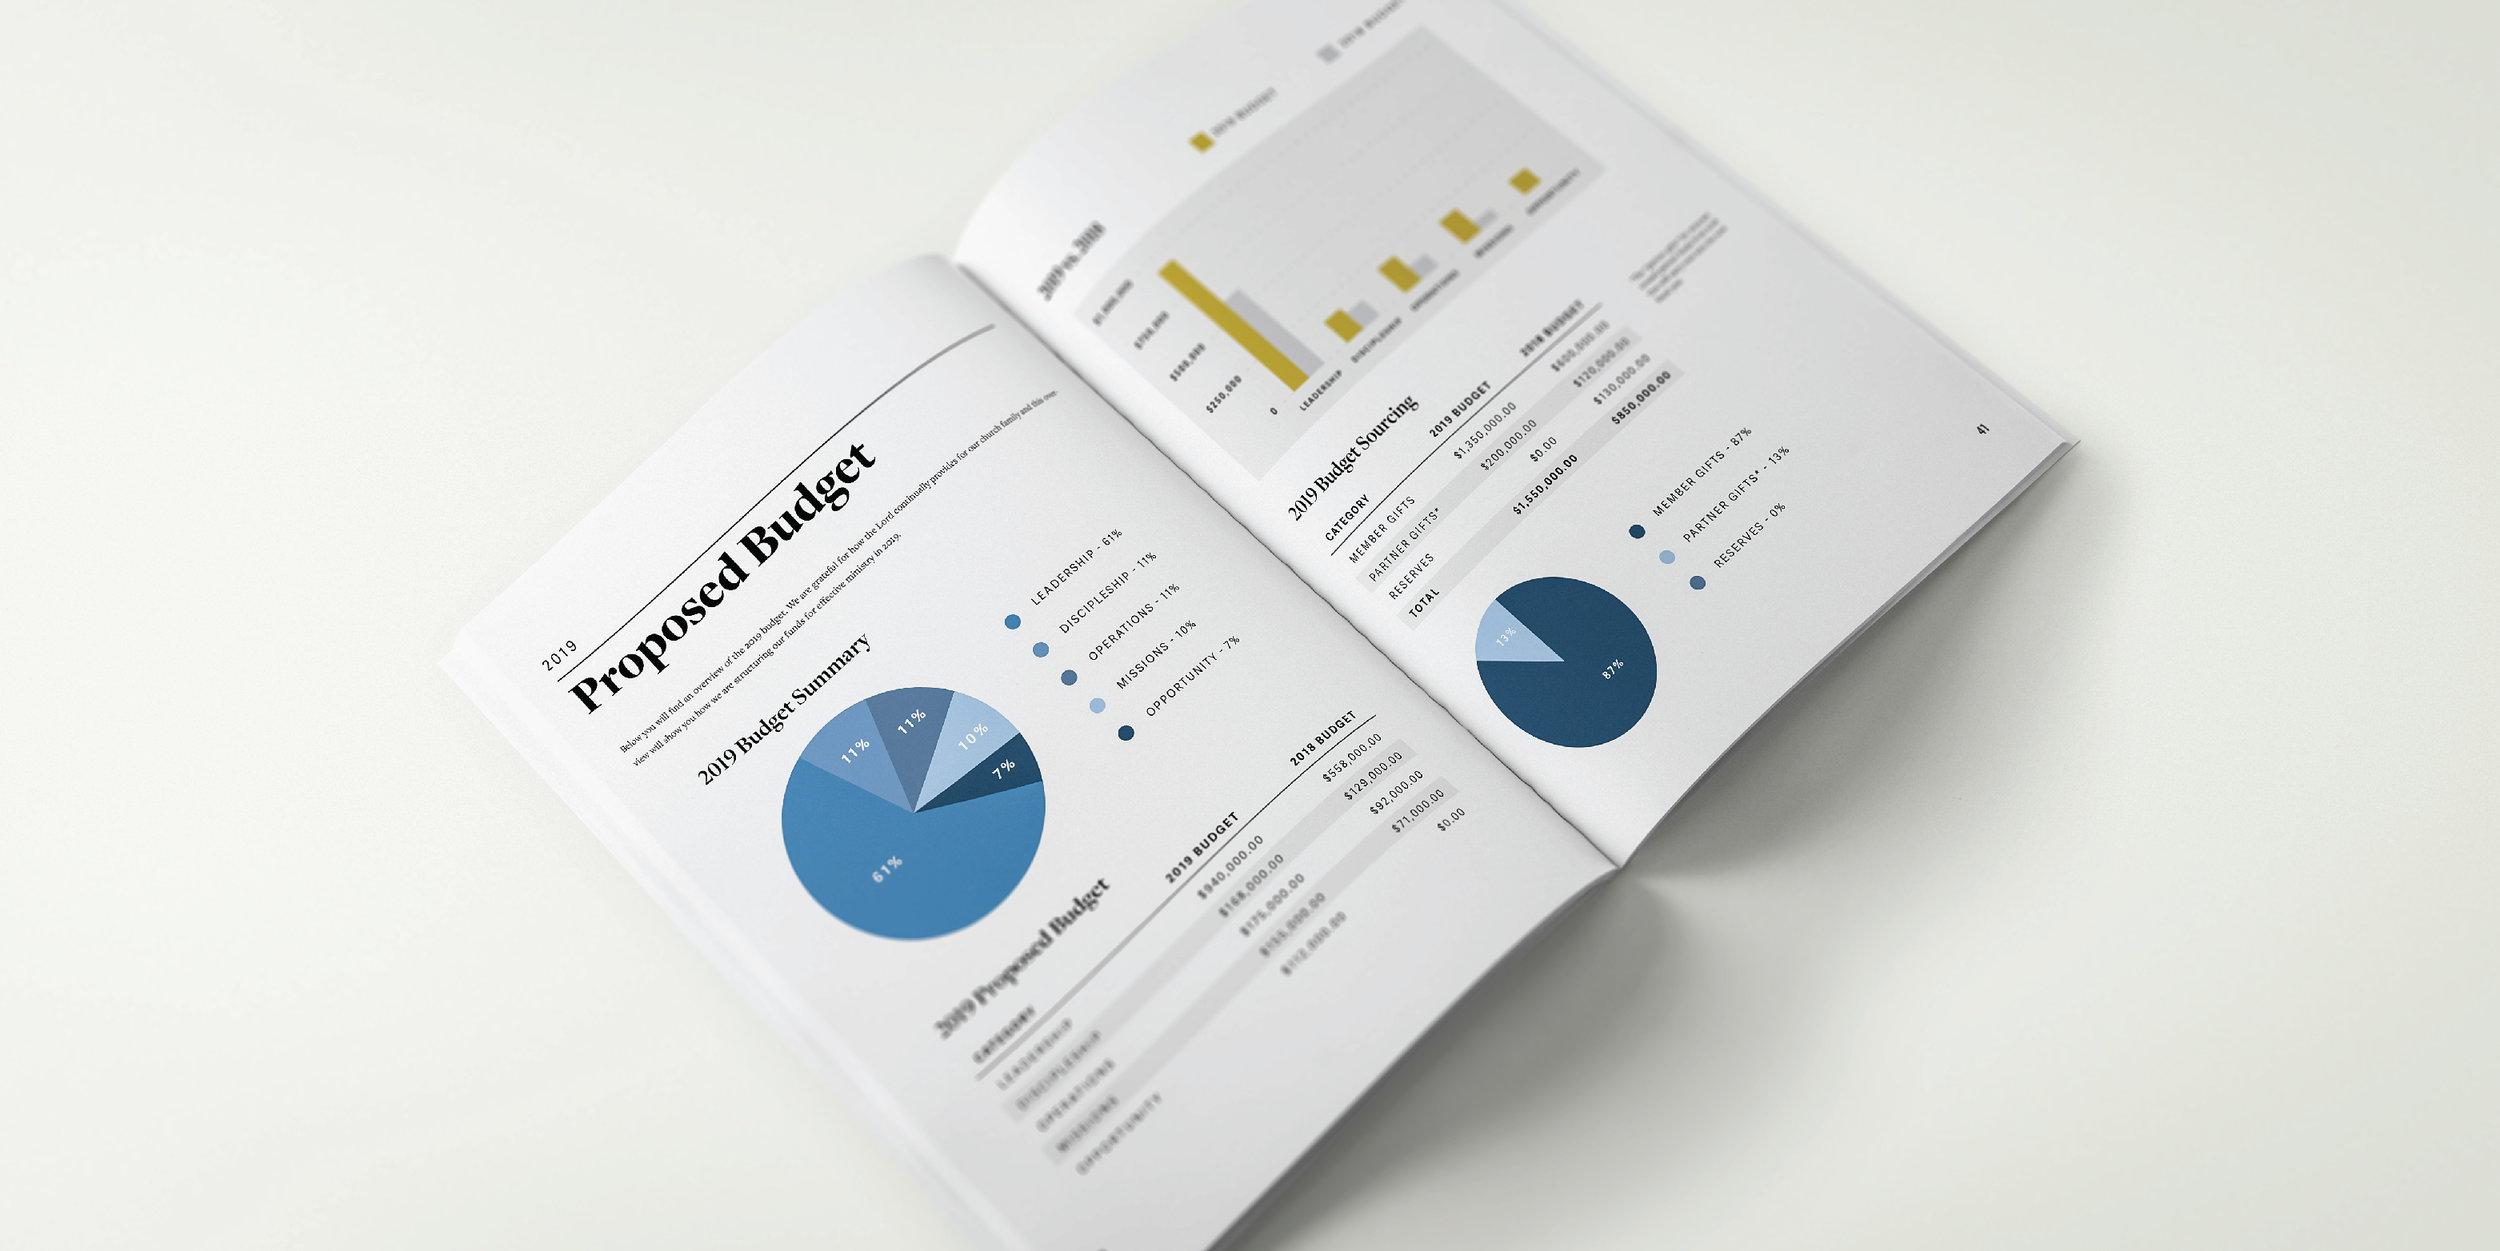 Quarterly-Case-Study-Images-05.jpg